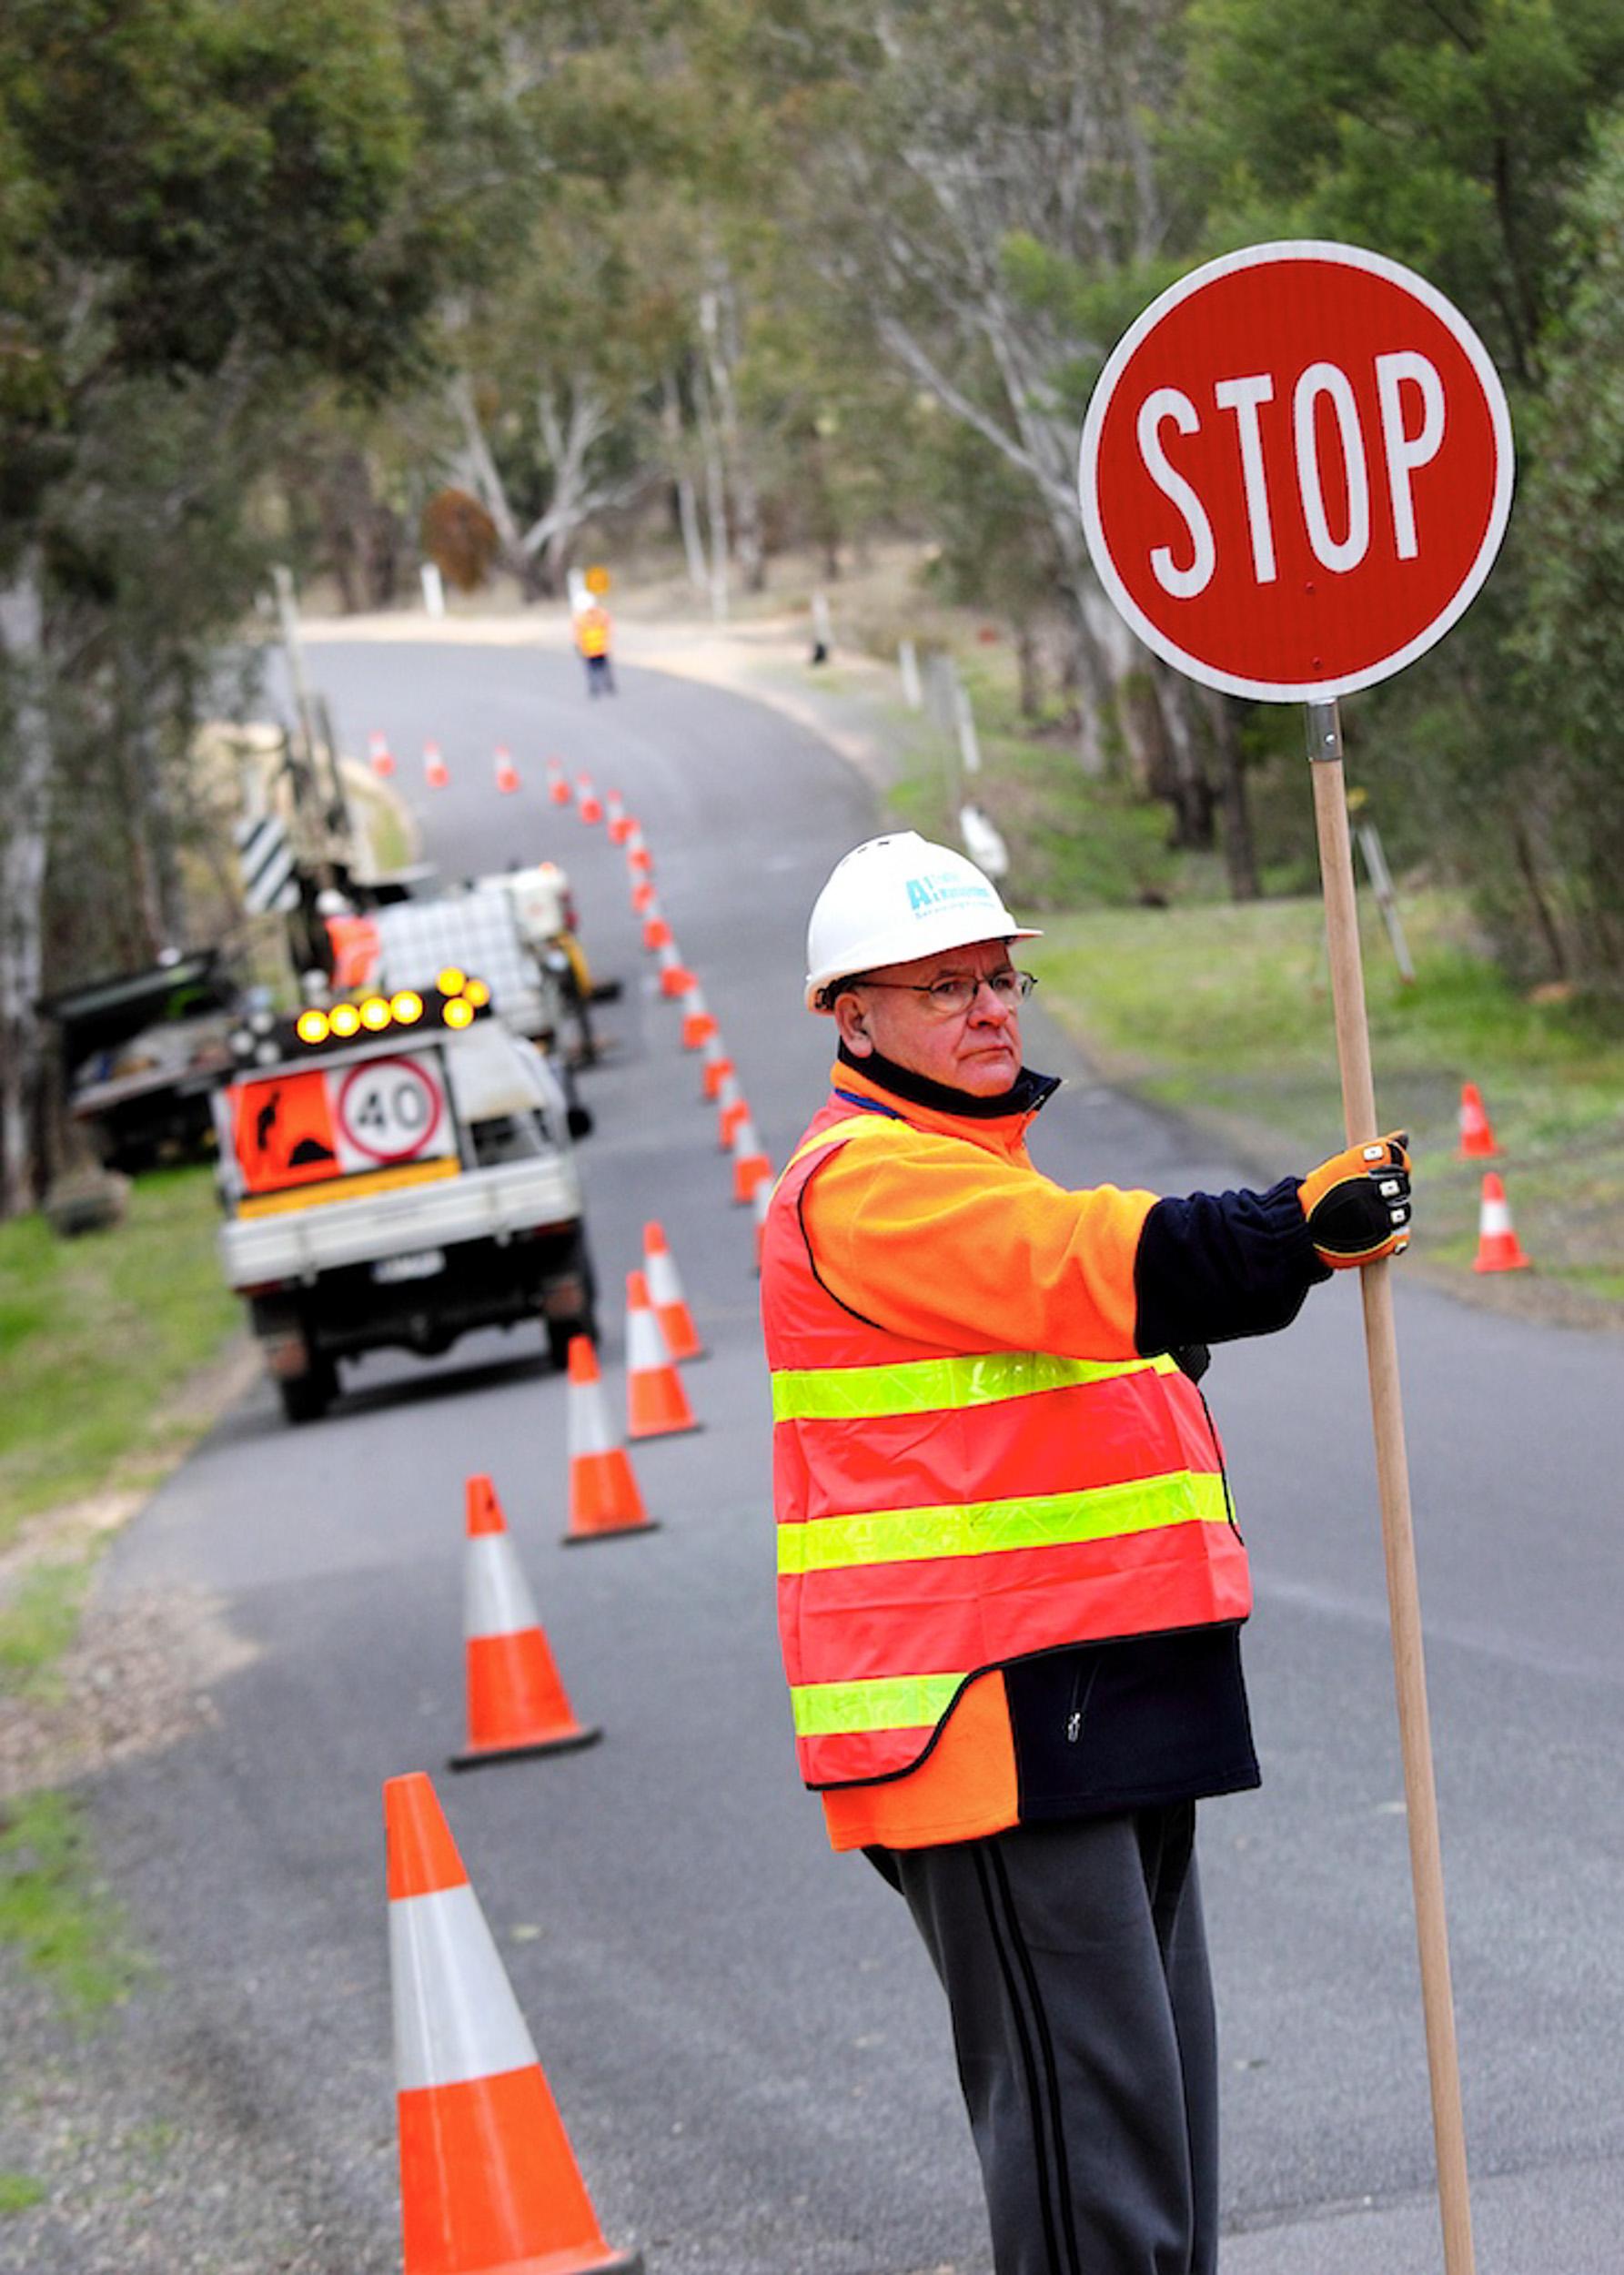 Client: A1 Traffic Management